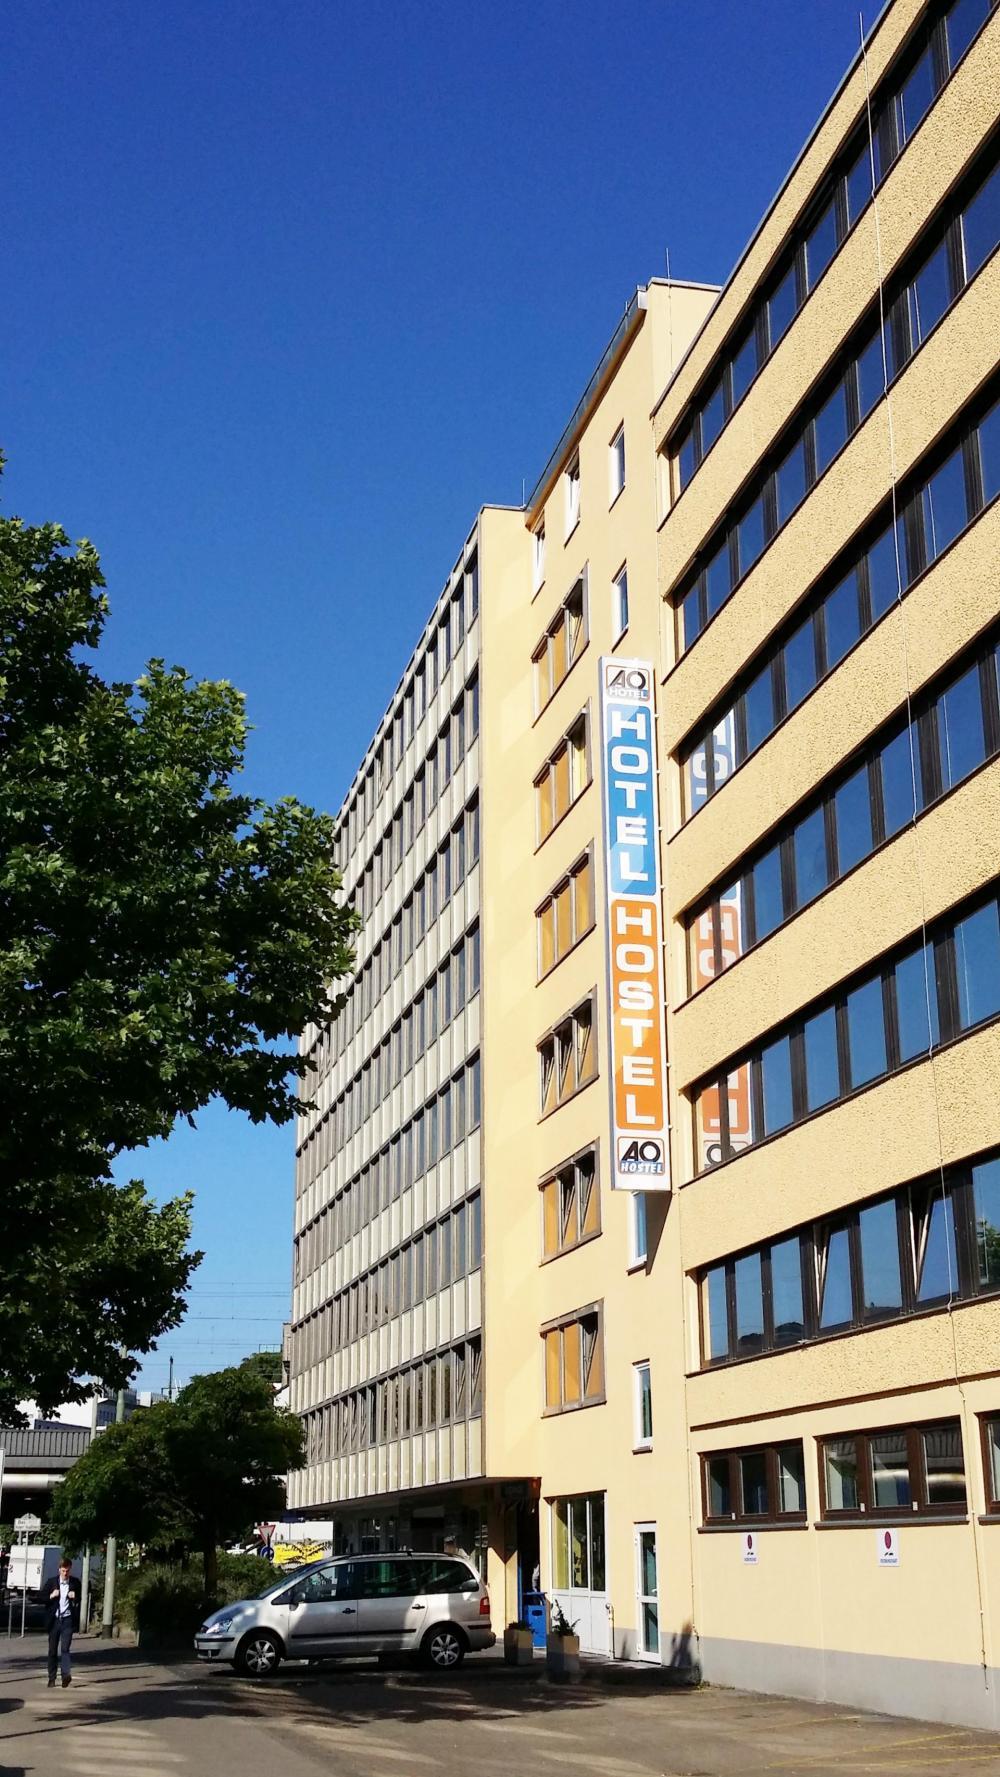 A&O Frankfurt Galluswarte Hostel - Herbergen.com